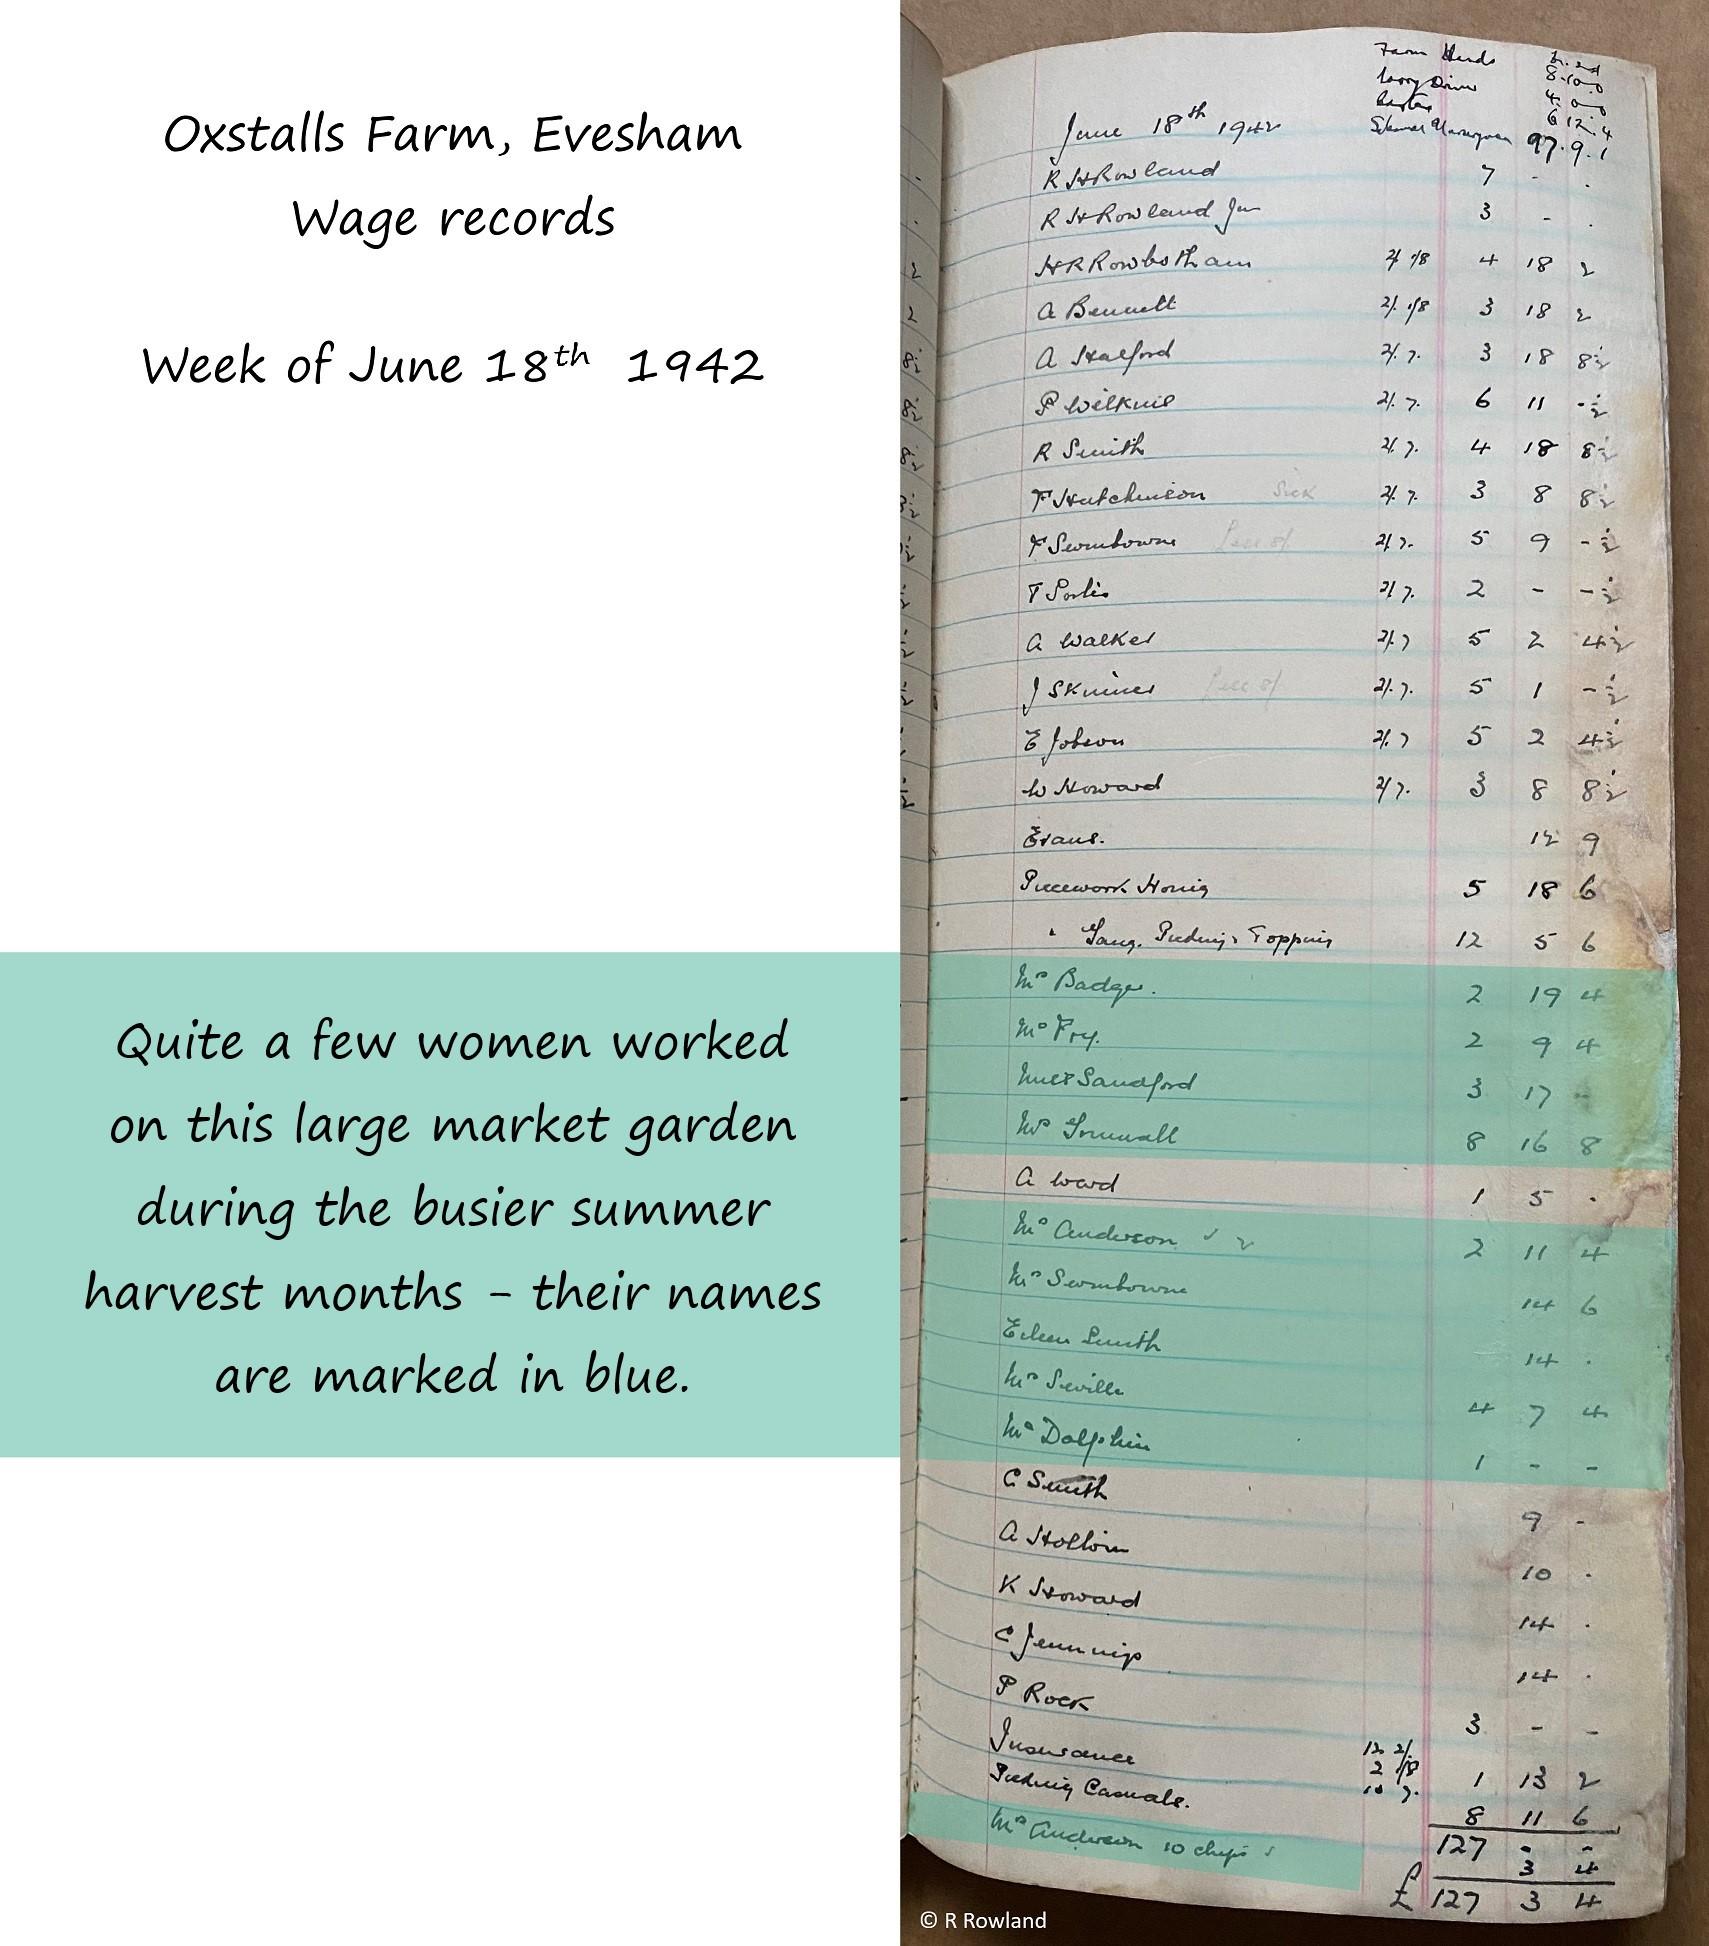 Wage records - Oxstalls Farm 1942